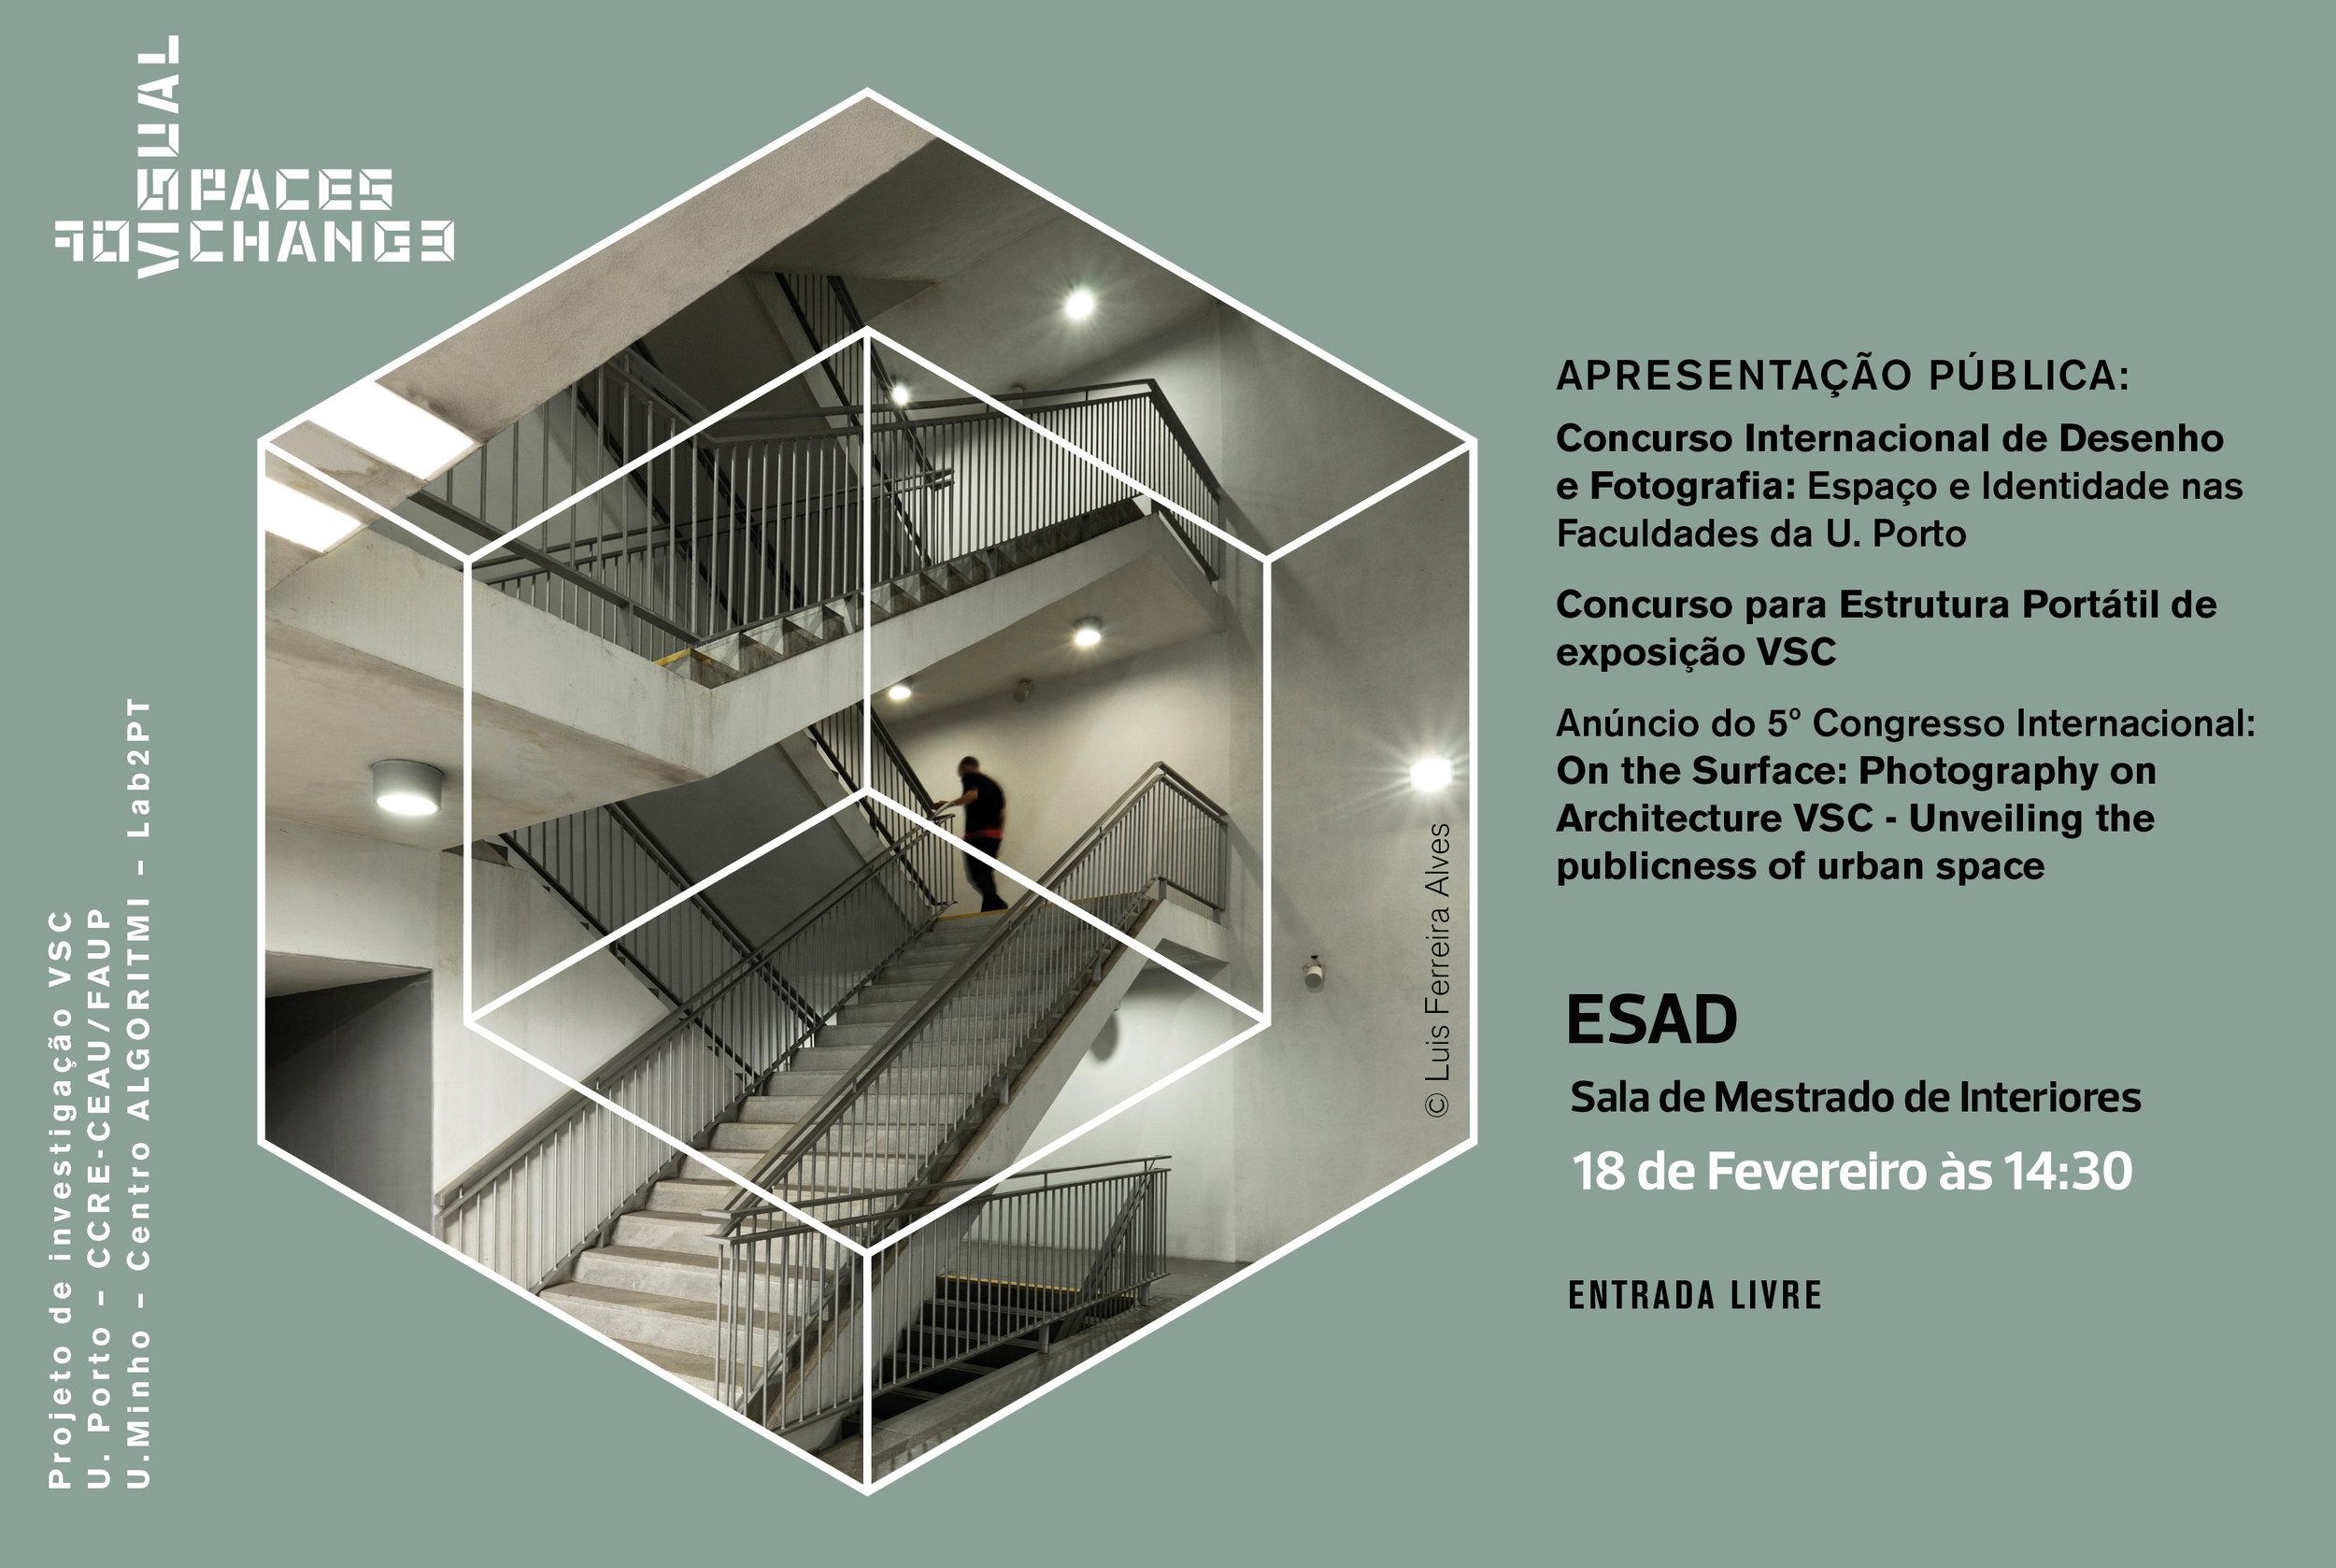 Banner Apresentação ESAD.jpg